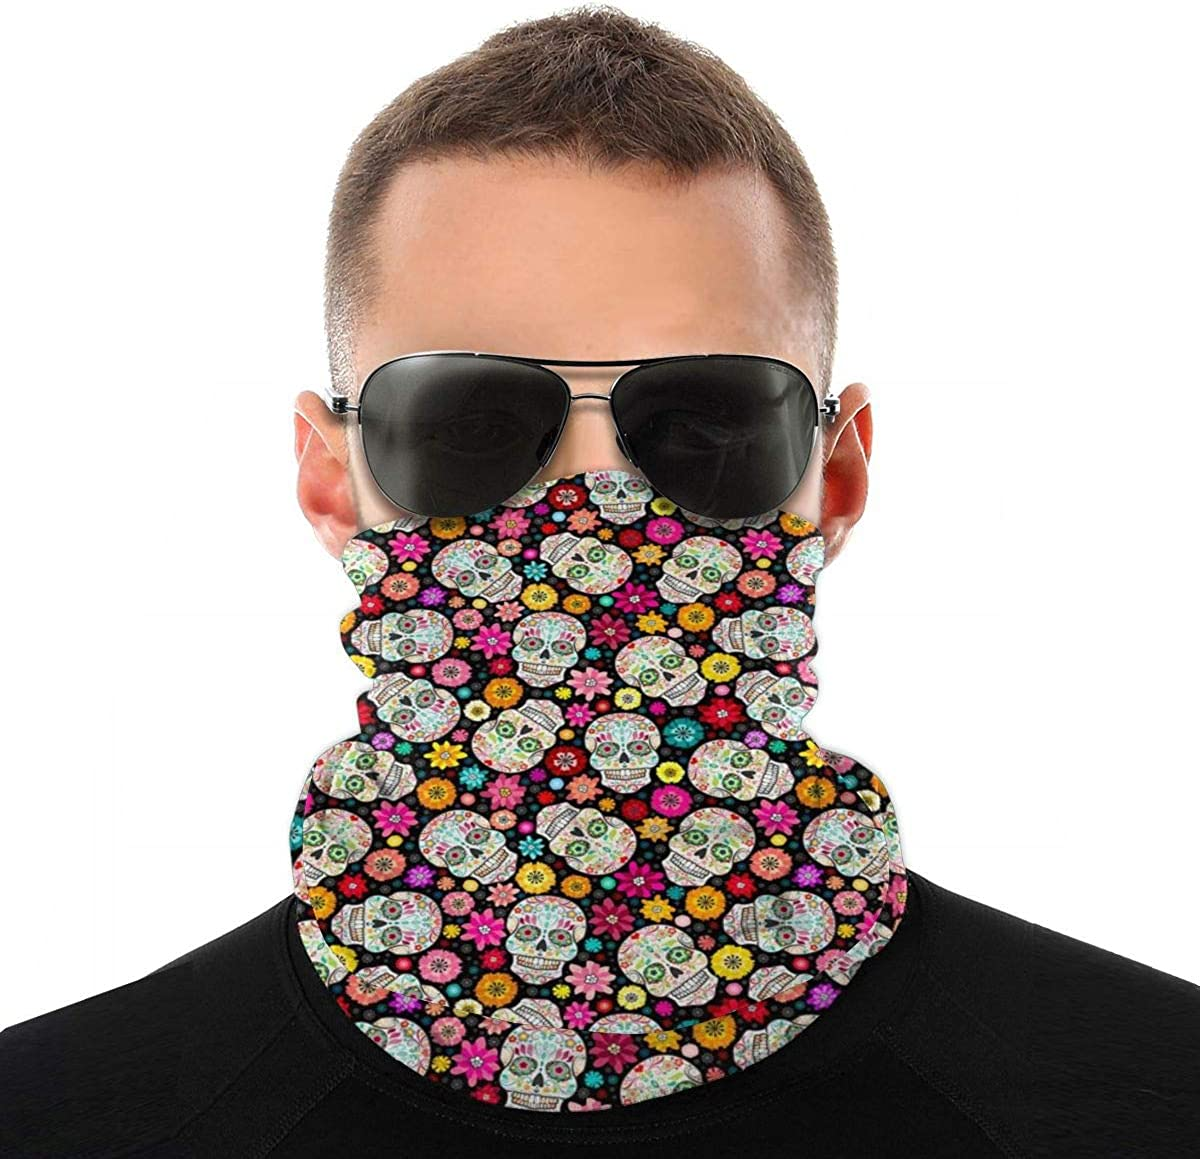 Floral Skull Face Mask Neck Gaiter Headwear for Women Men Face Scarf